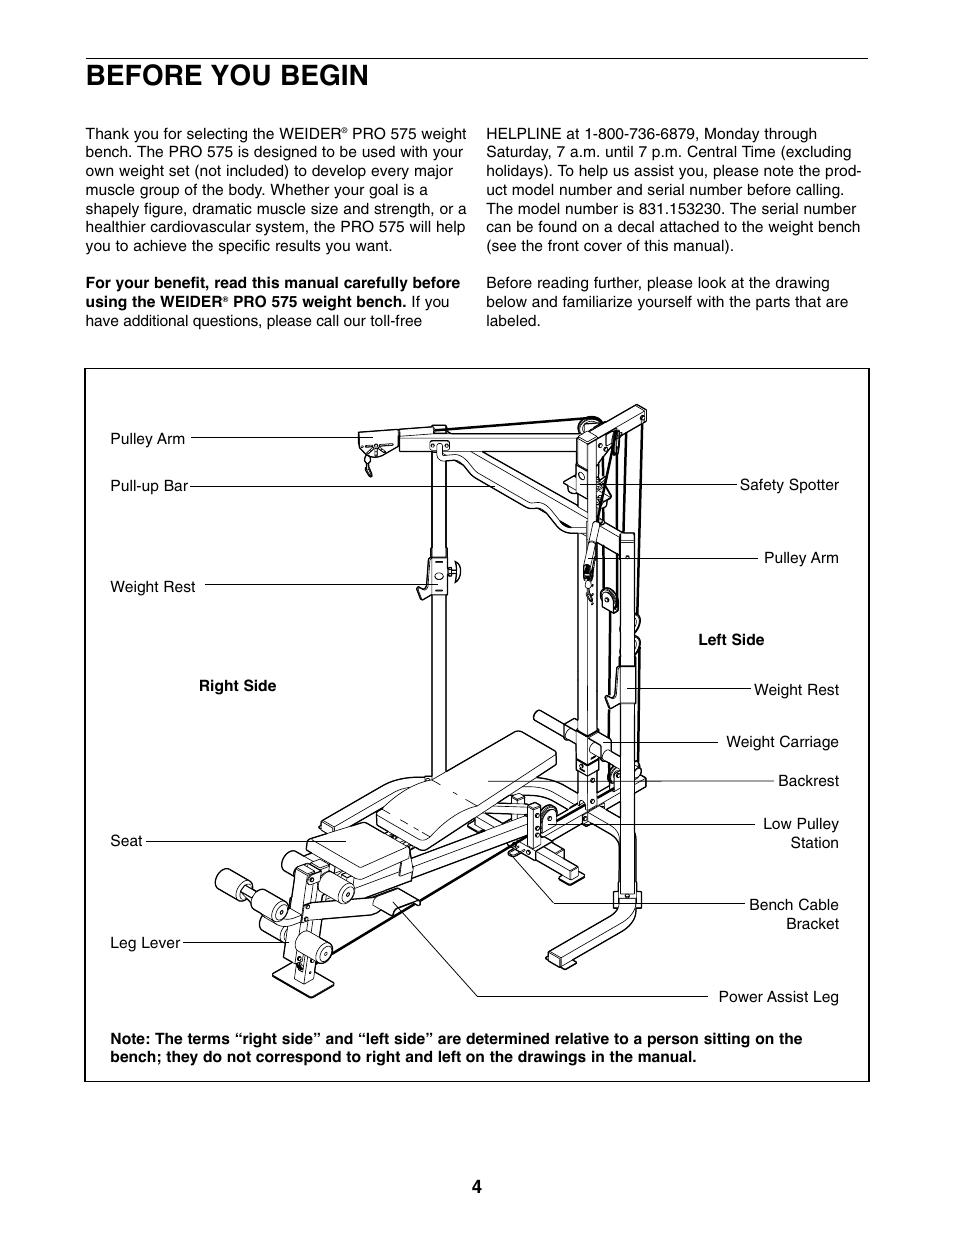 Weider pro 575 bench manuals.